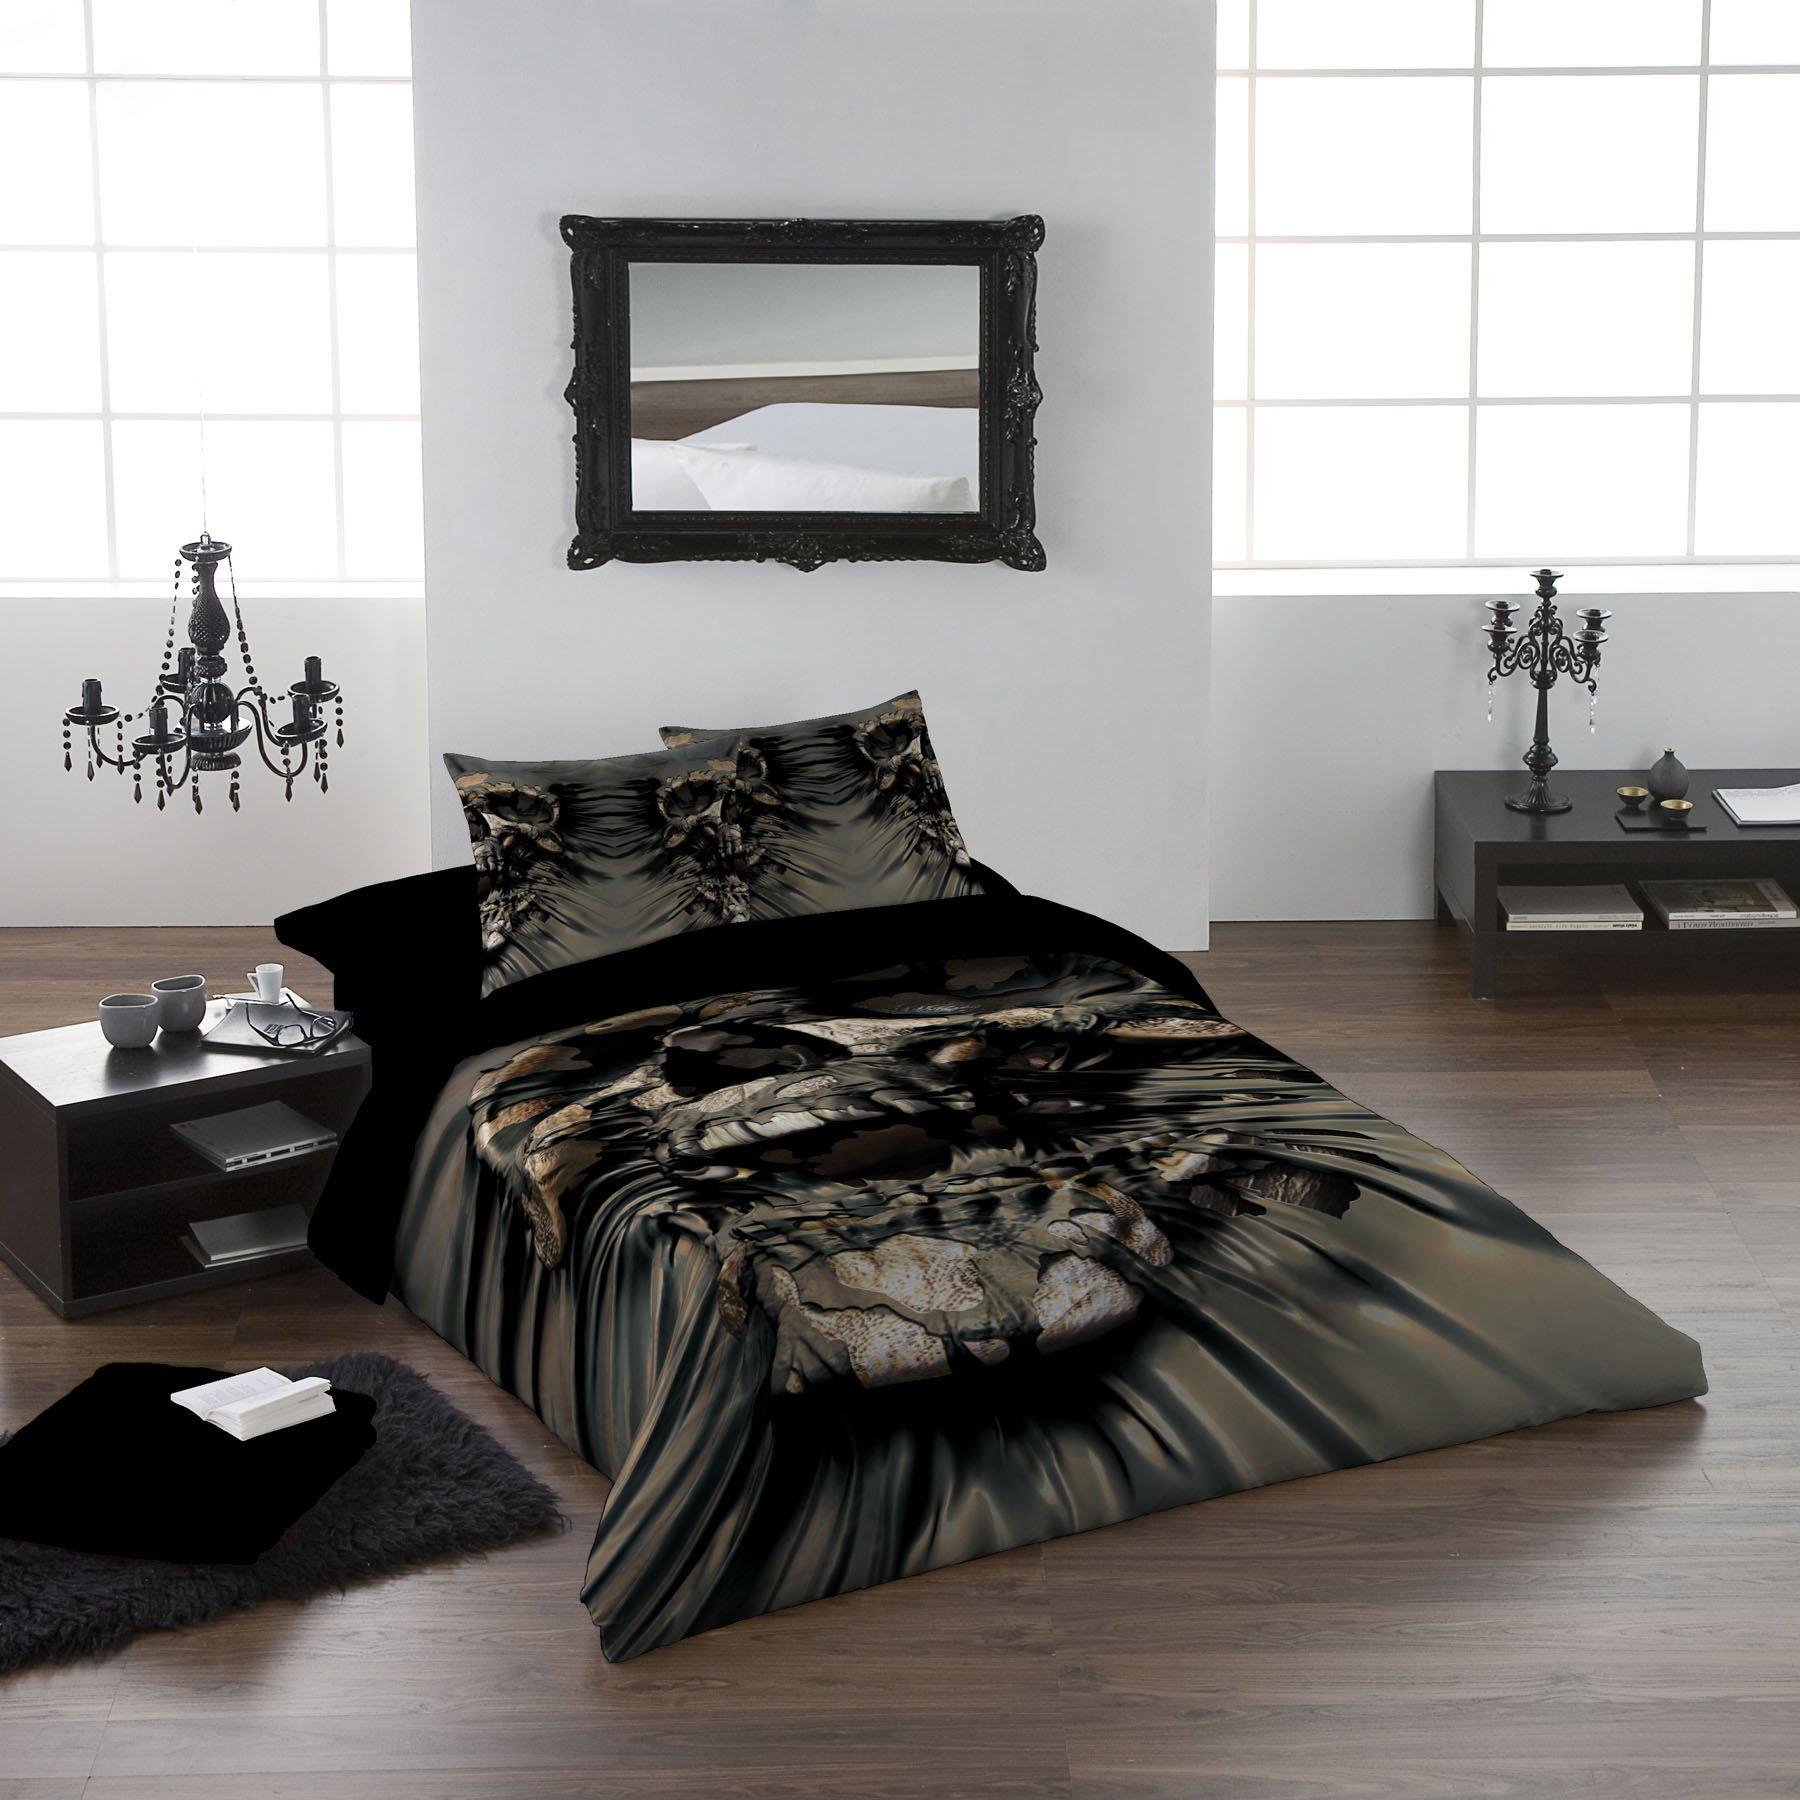 SKULL RIP Queensize Bed Duvet & Pillow Bed Linen Set Officially Licenced David Penfound